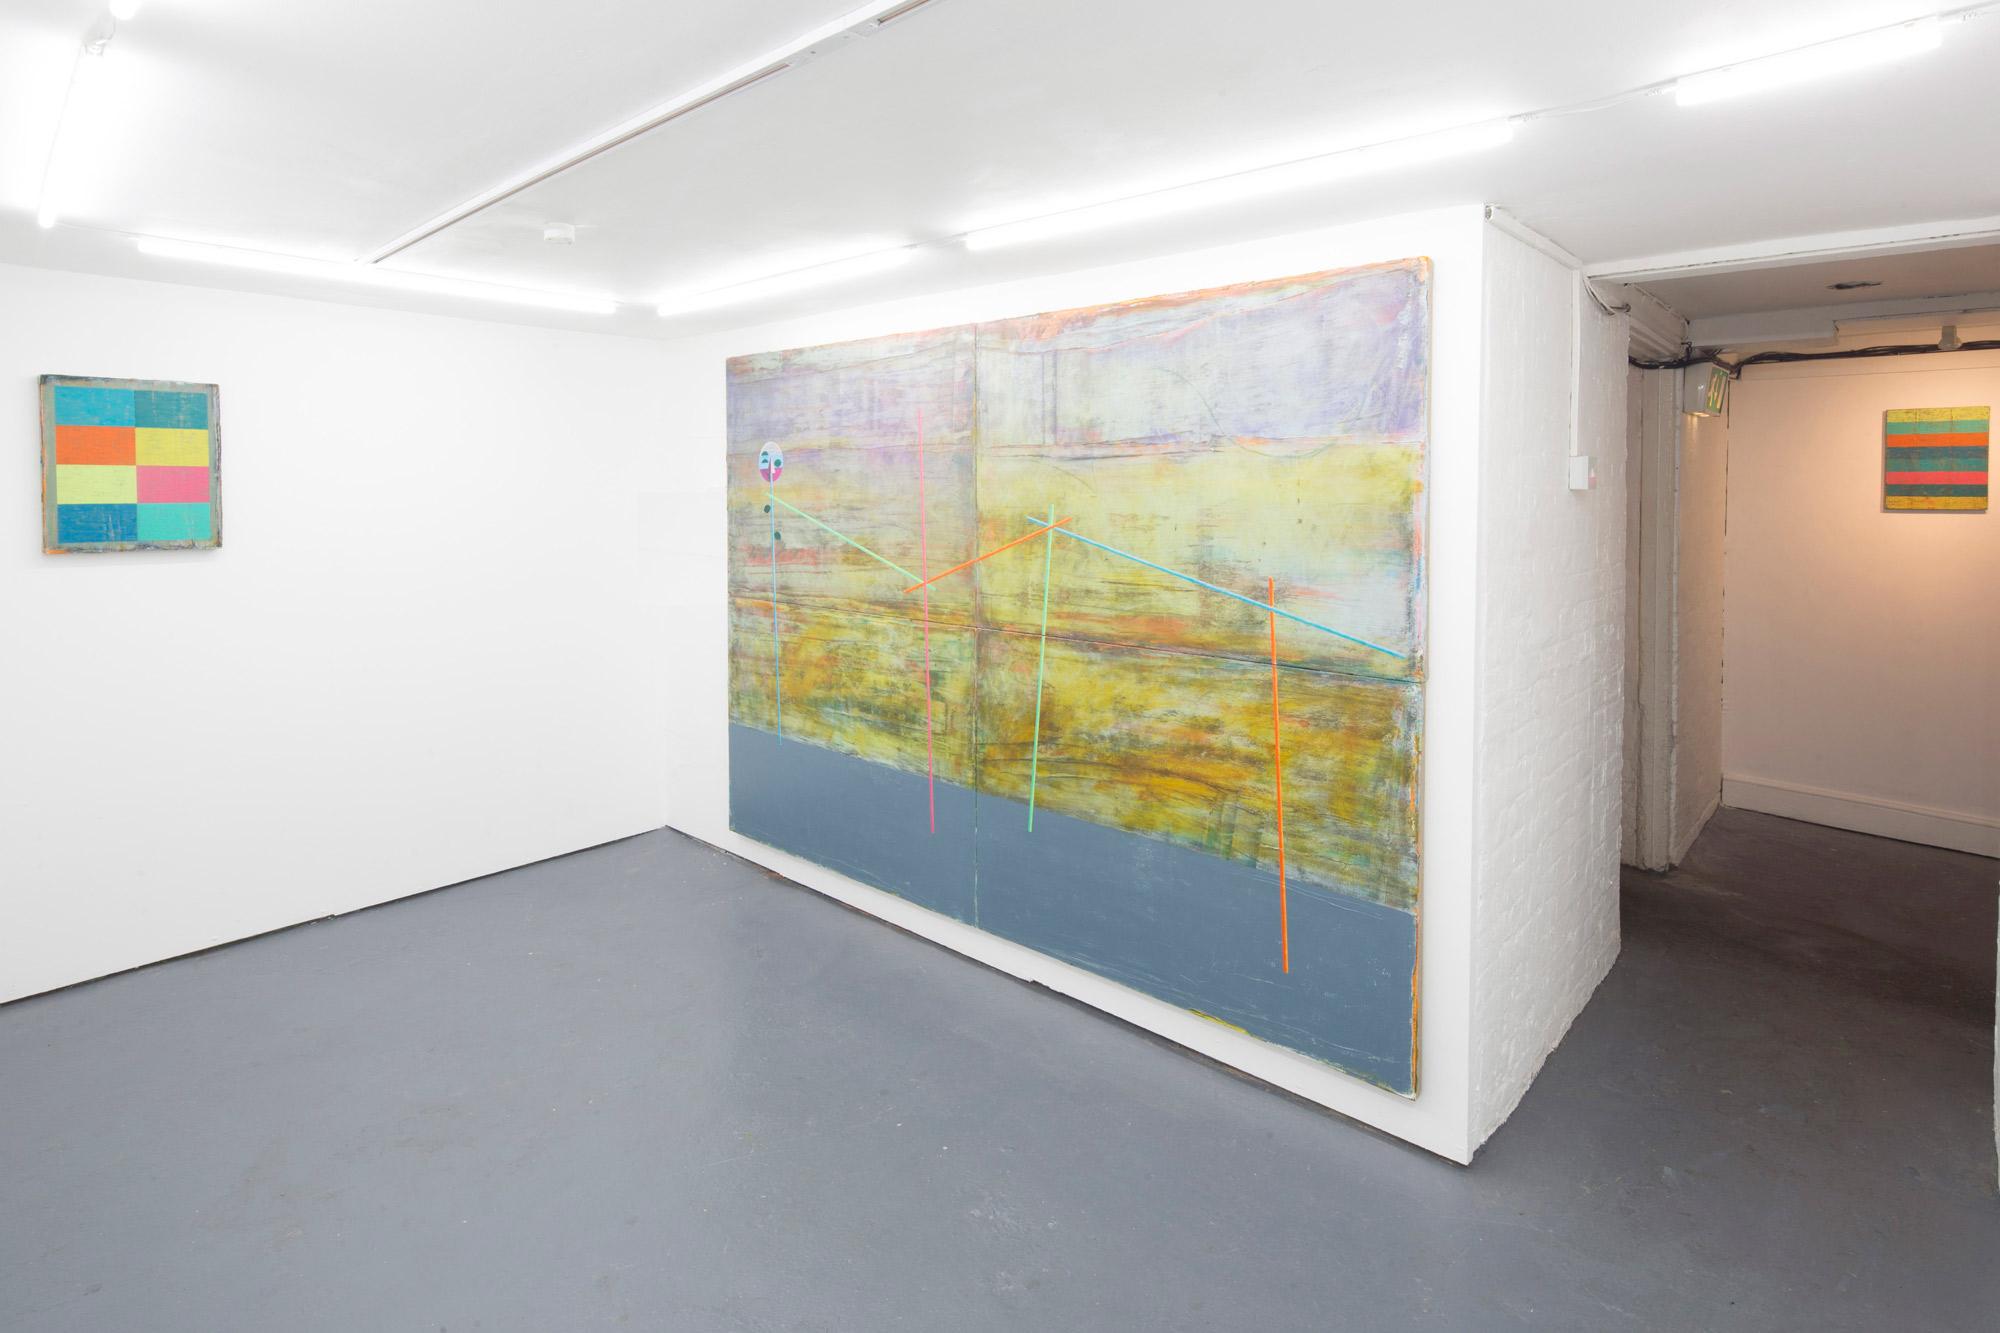 Rian Coughlan: daysaideadhead at LUNGLEY Gallery, 2019